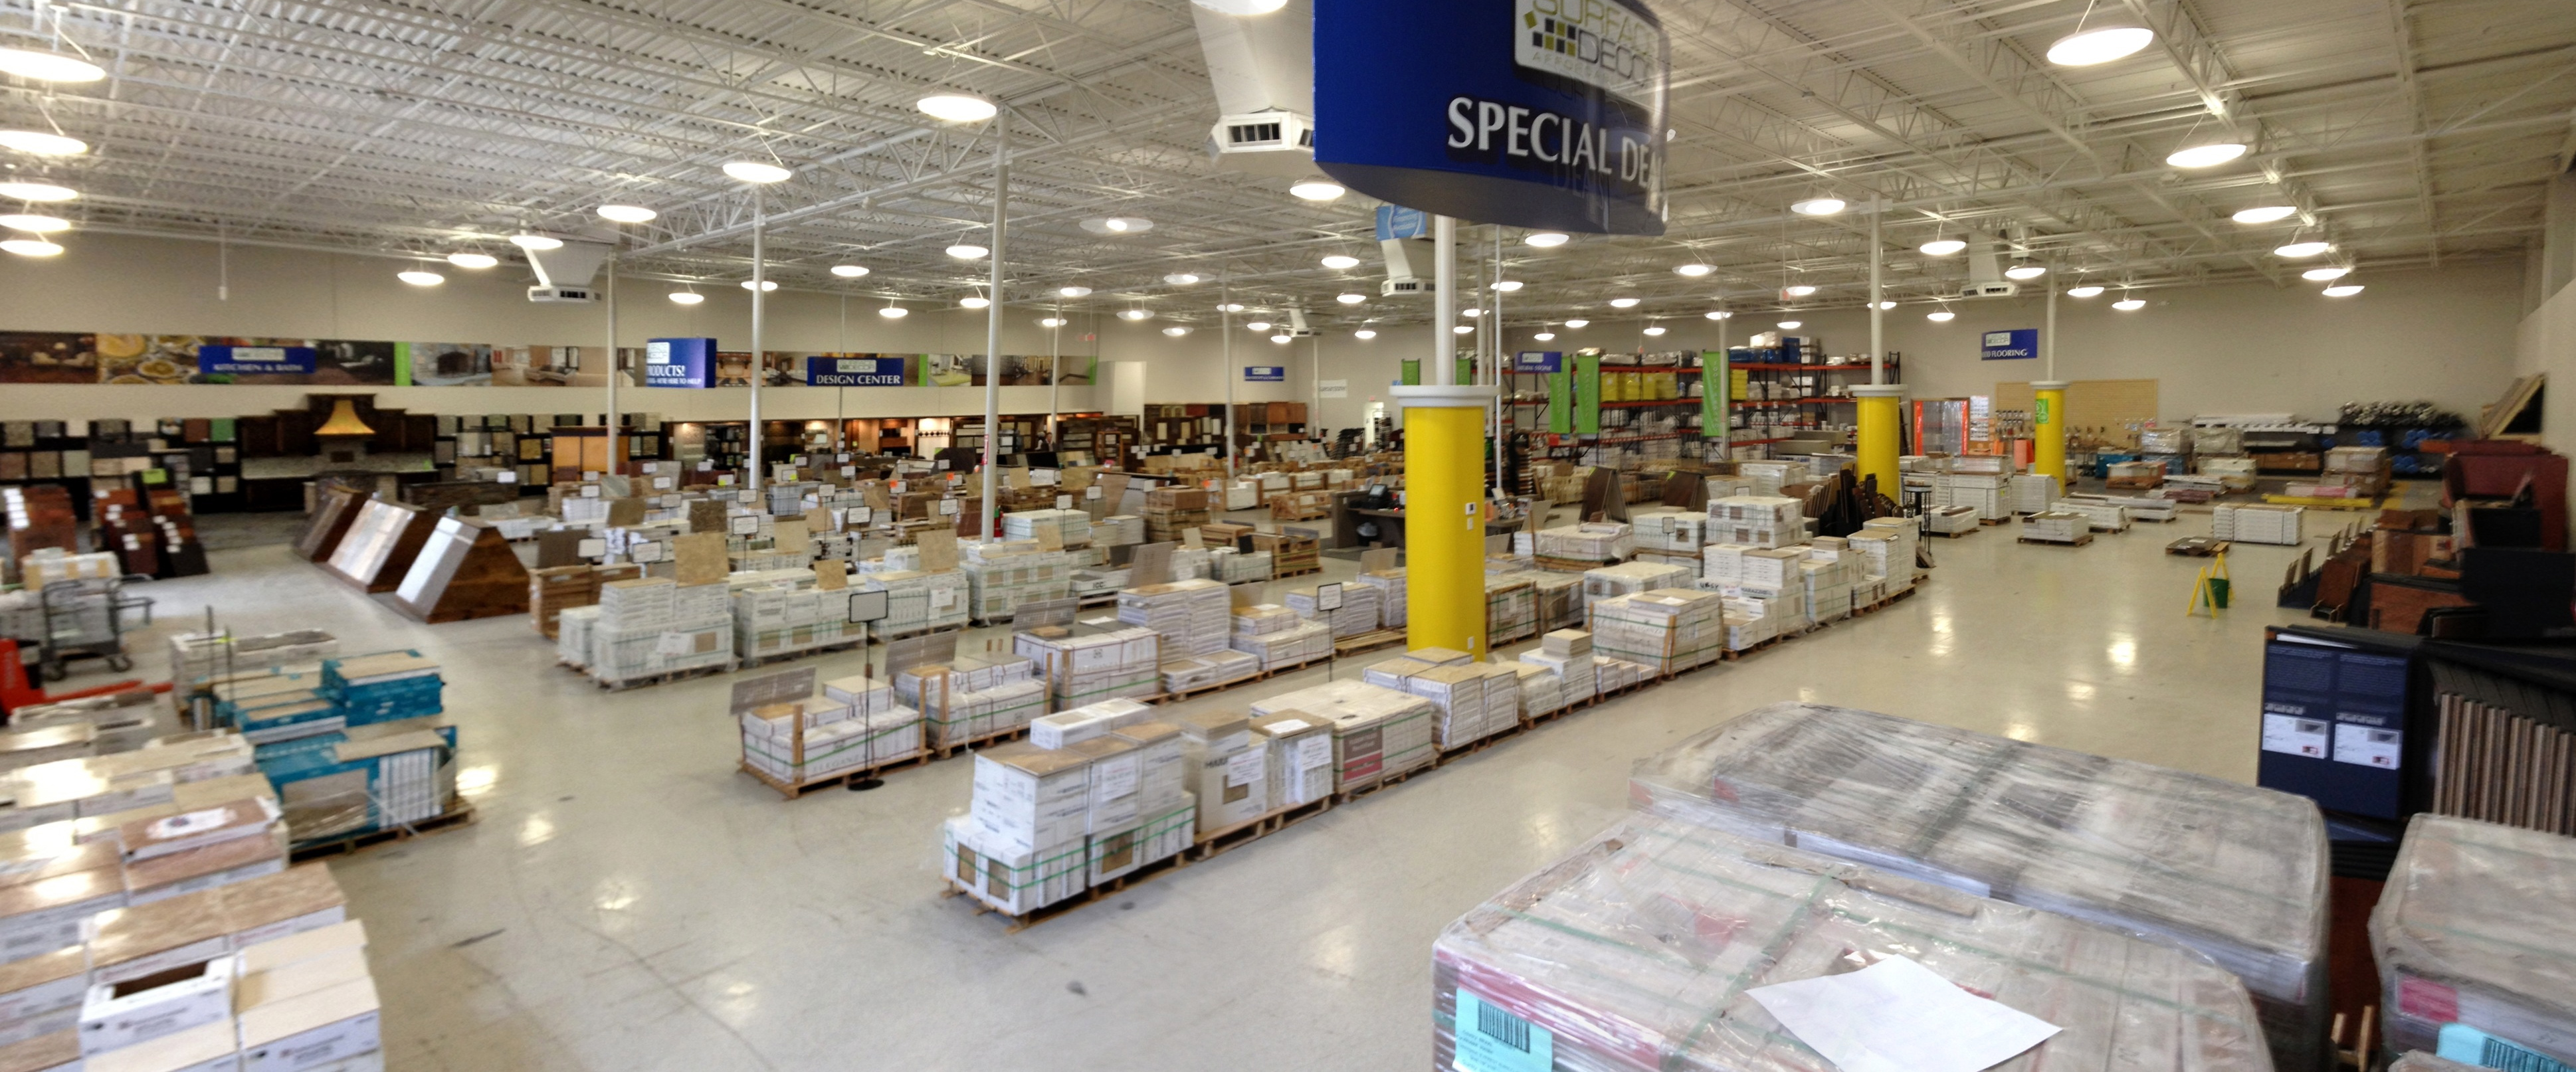 Flooring Services Farmers Branch : Surface decor floor warehouse dallas announces its new